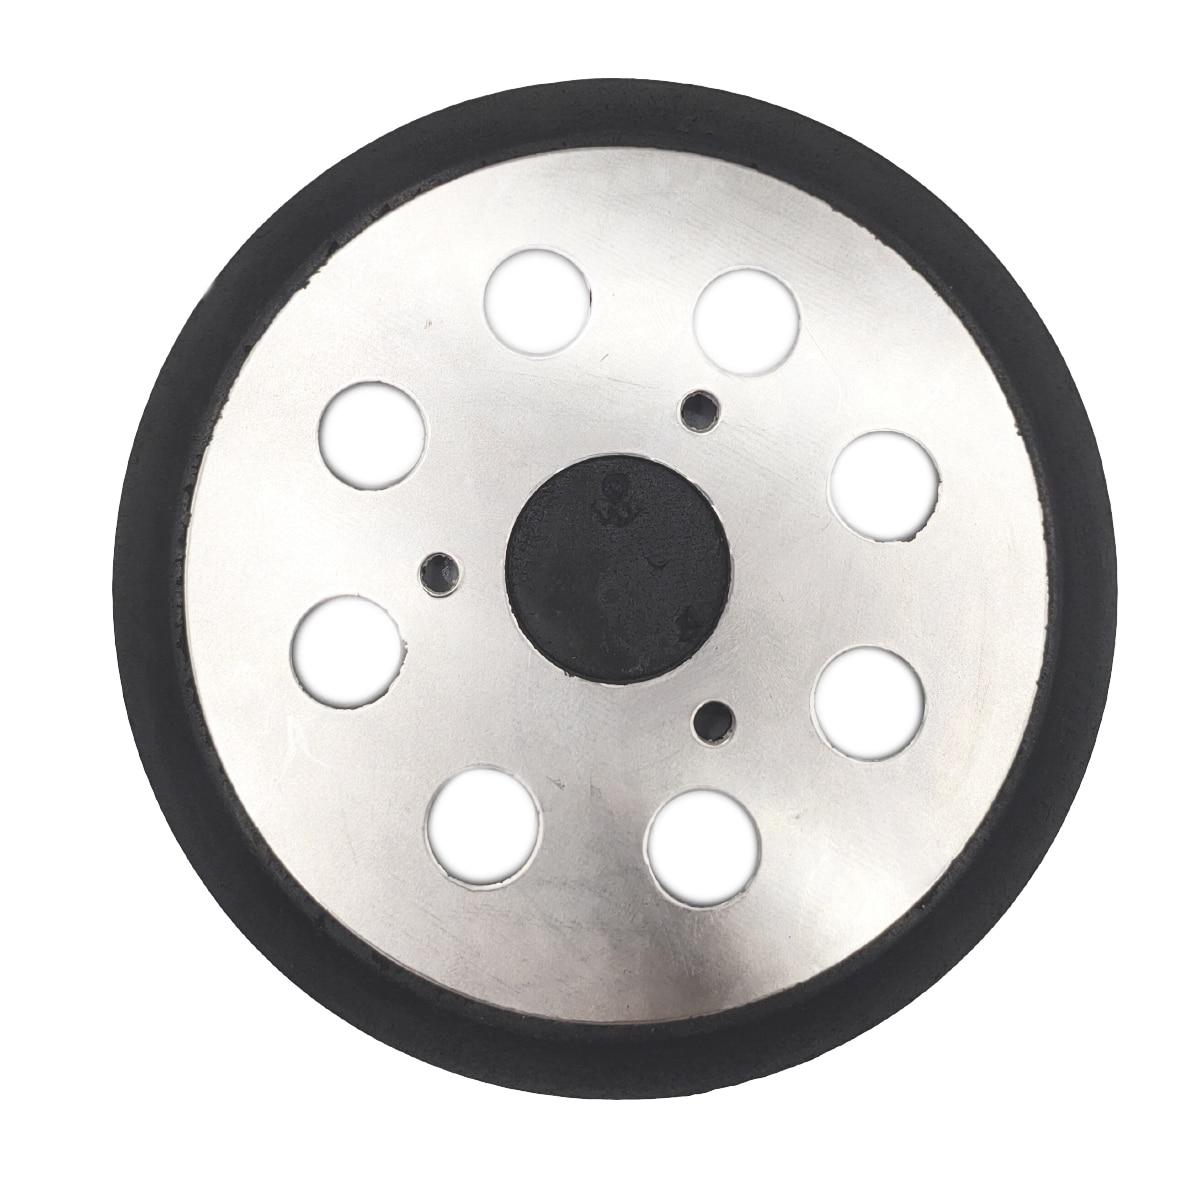 STAC 5 Inch 8 Hole Orbital Sander Backing Pads Hook and Loop Replacement Sander Pad